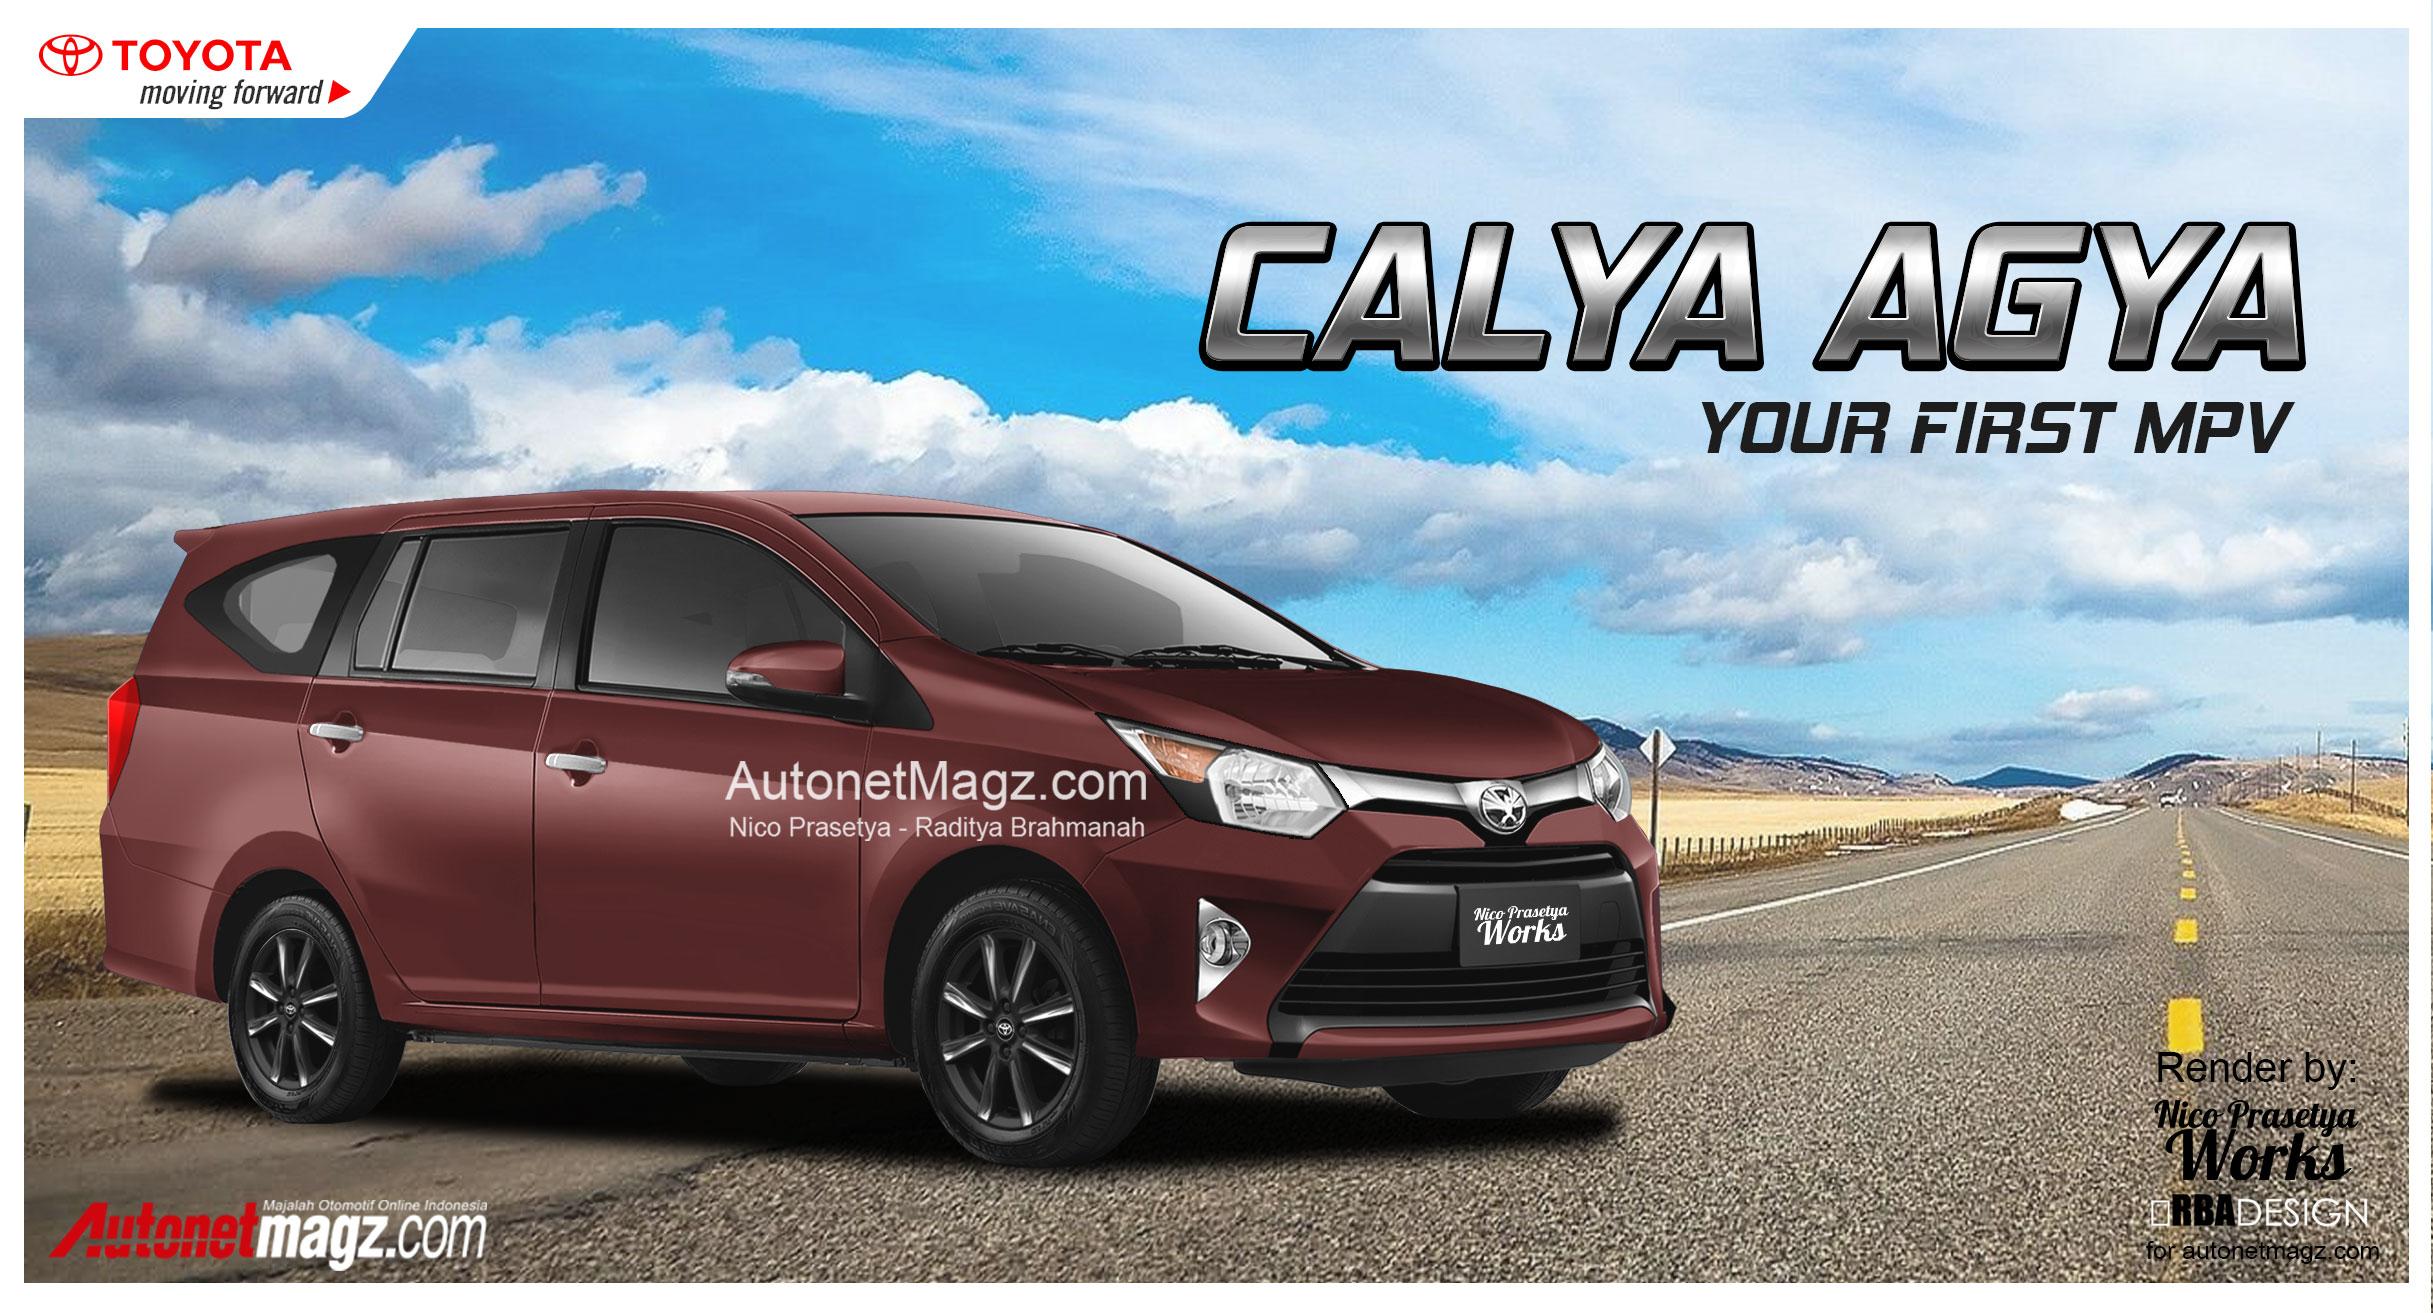 Ini Wujud Toyota Calya Agya 7 Seater Pembunuh Datsun Go Autonetmagz